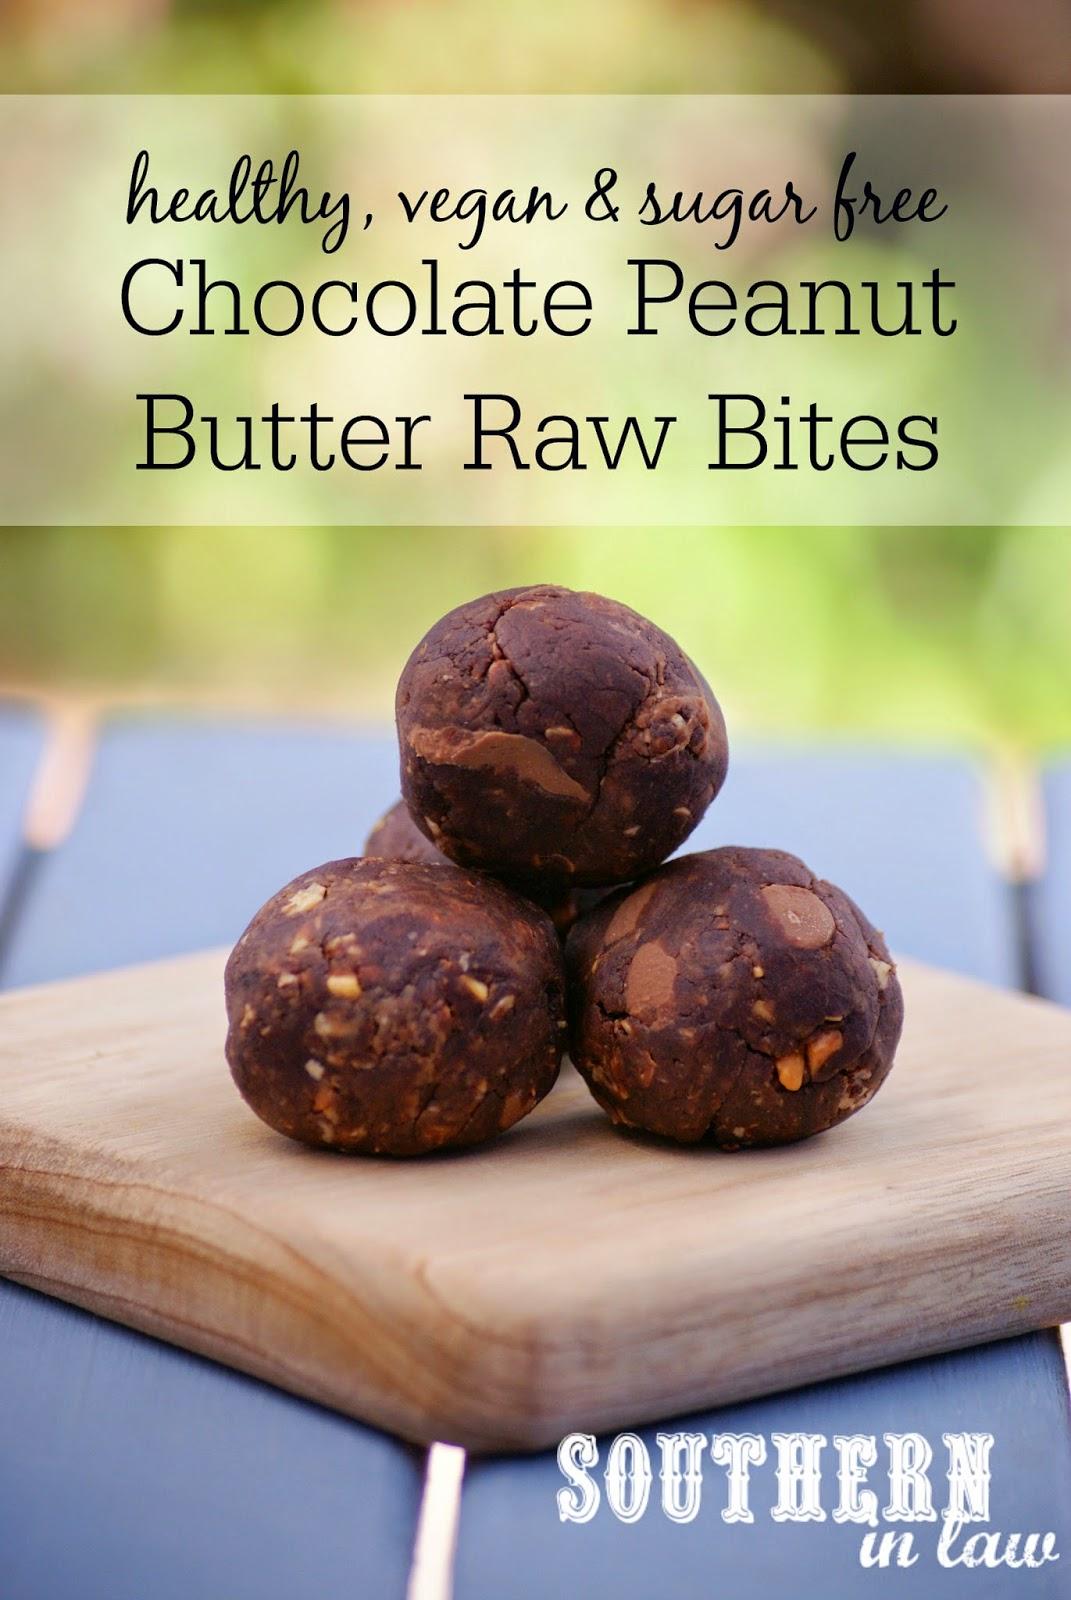 Healthy Raw Vegan Peanut Butter Chocolate Raw Brownie Bites Recipe - gluten free, sugar free